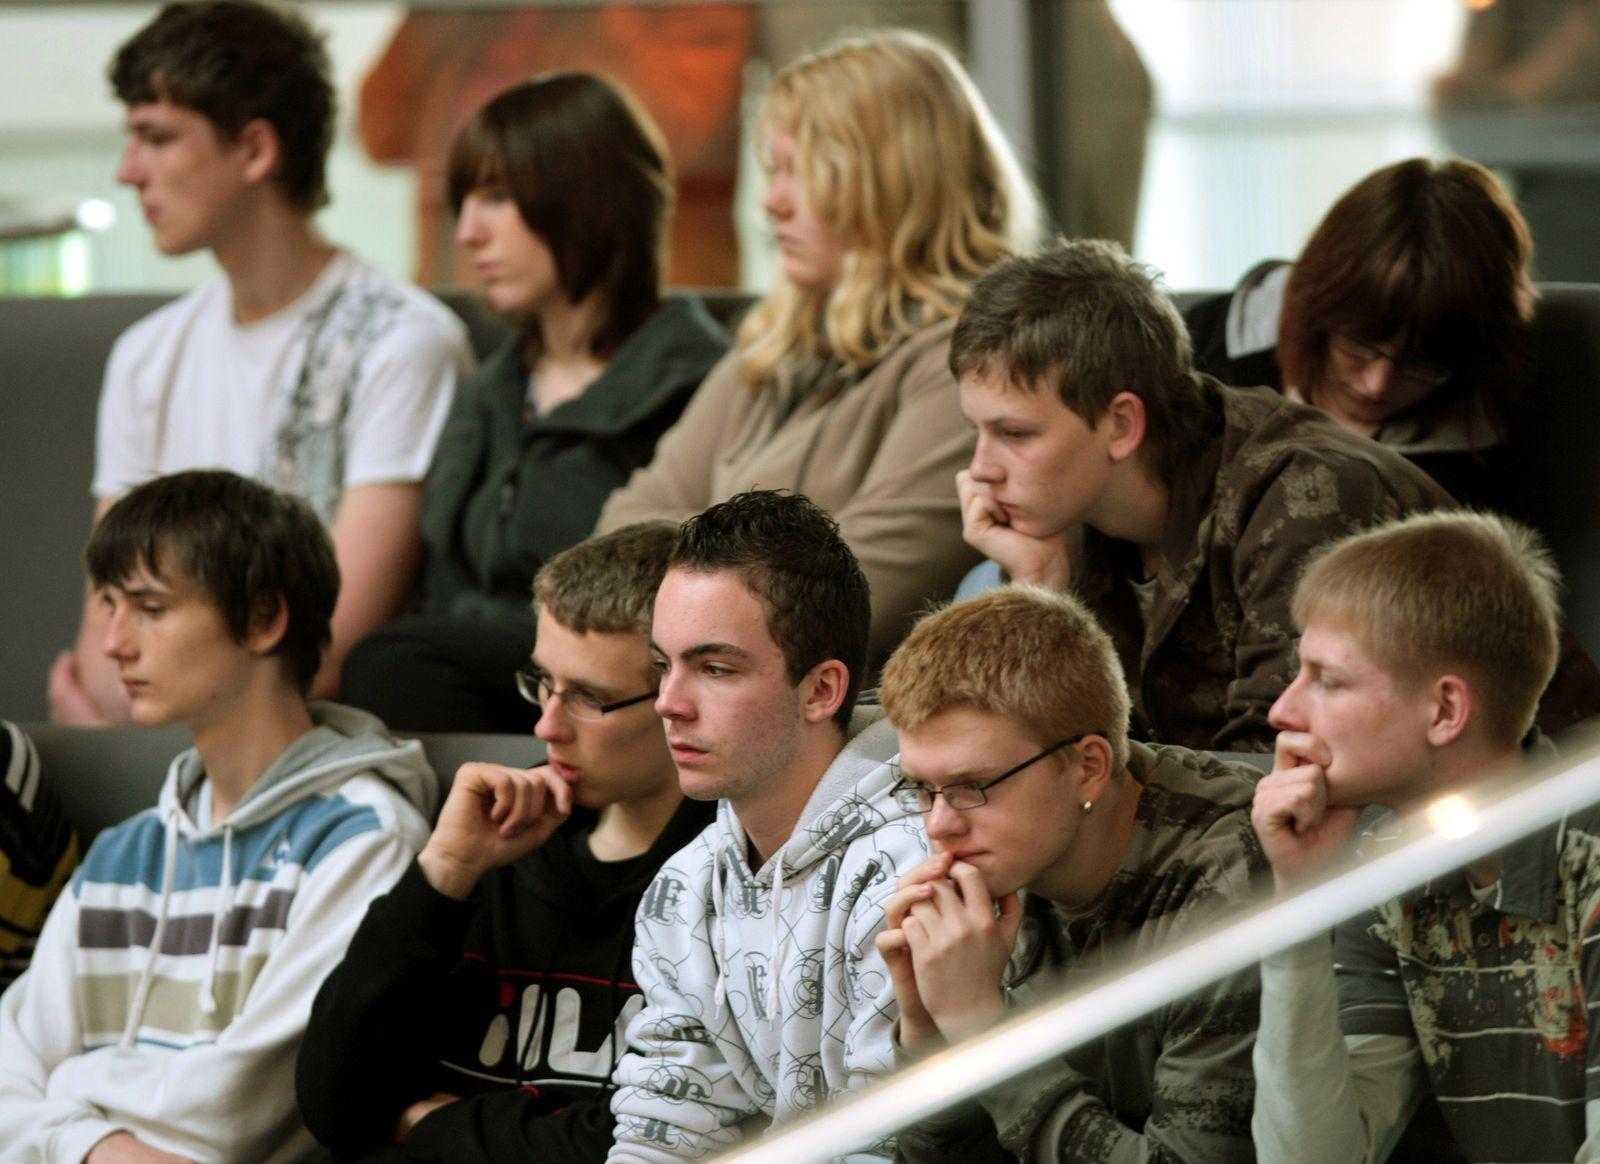 Jugendliche im Bundestag / Shell Jugendstudie